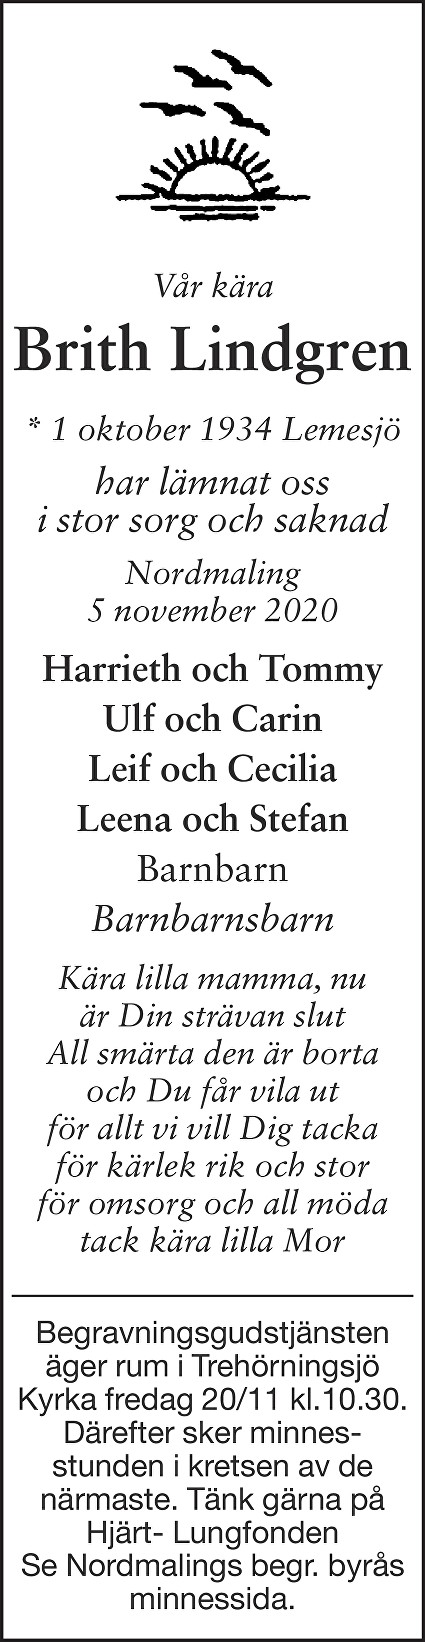 Brith Lindgren Death notice